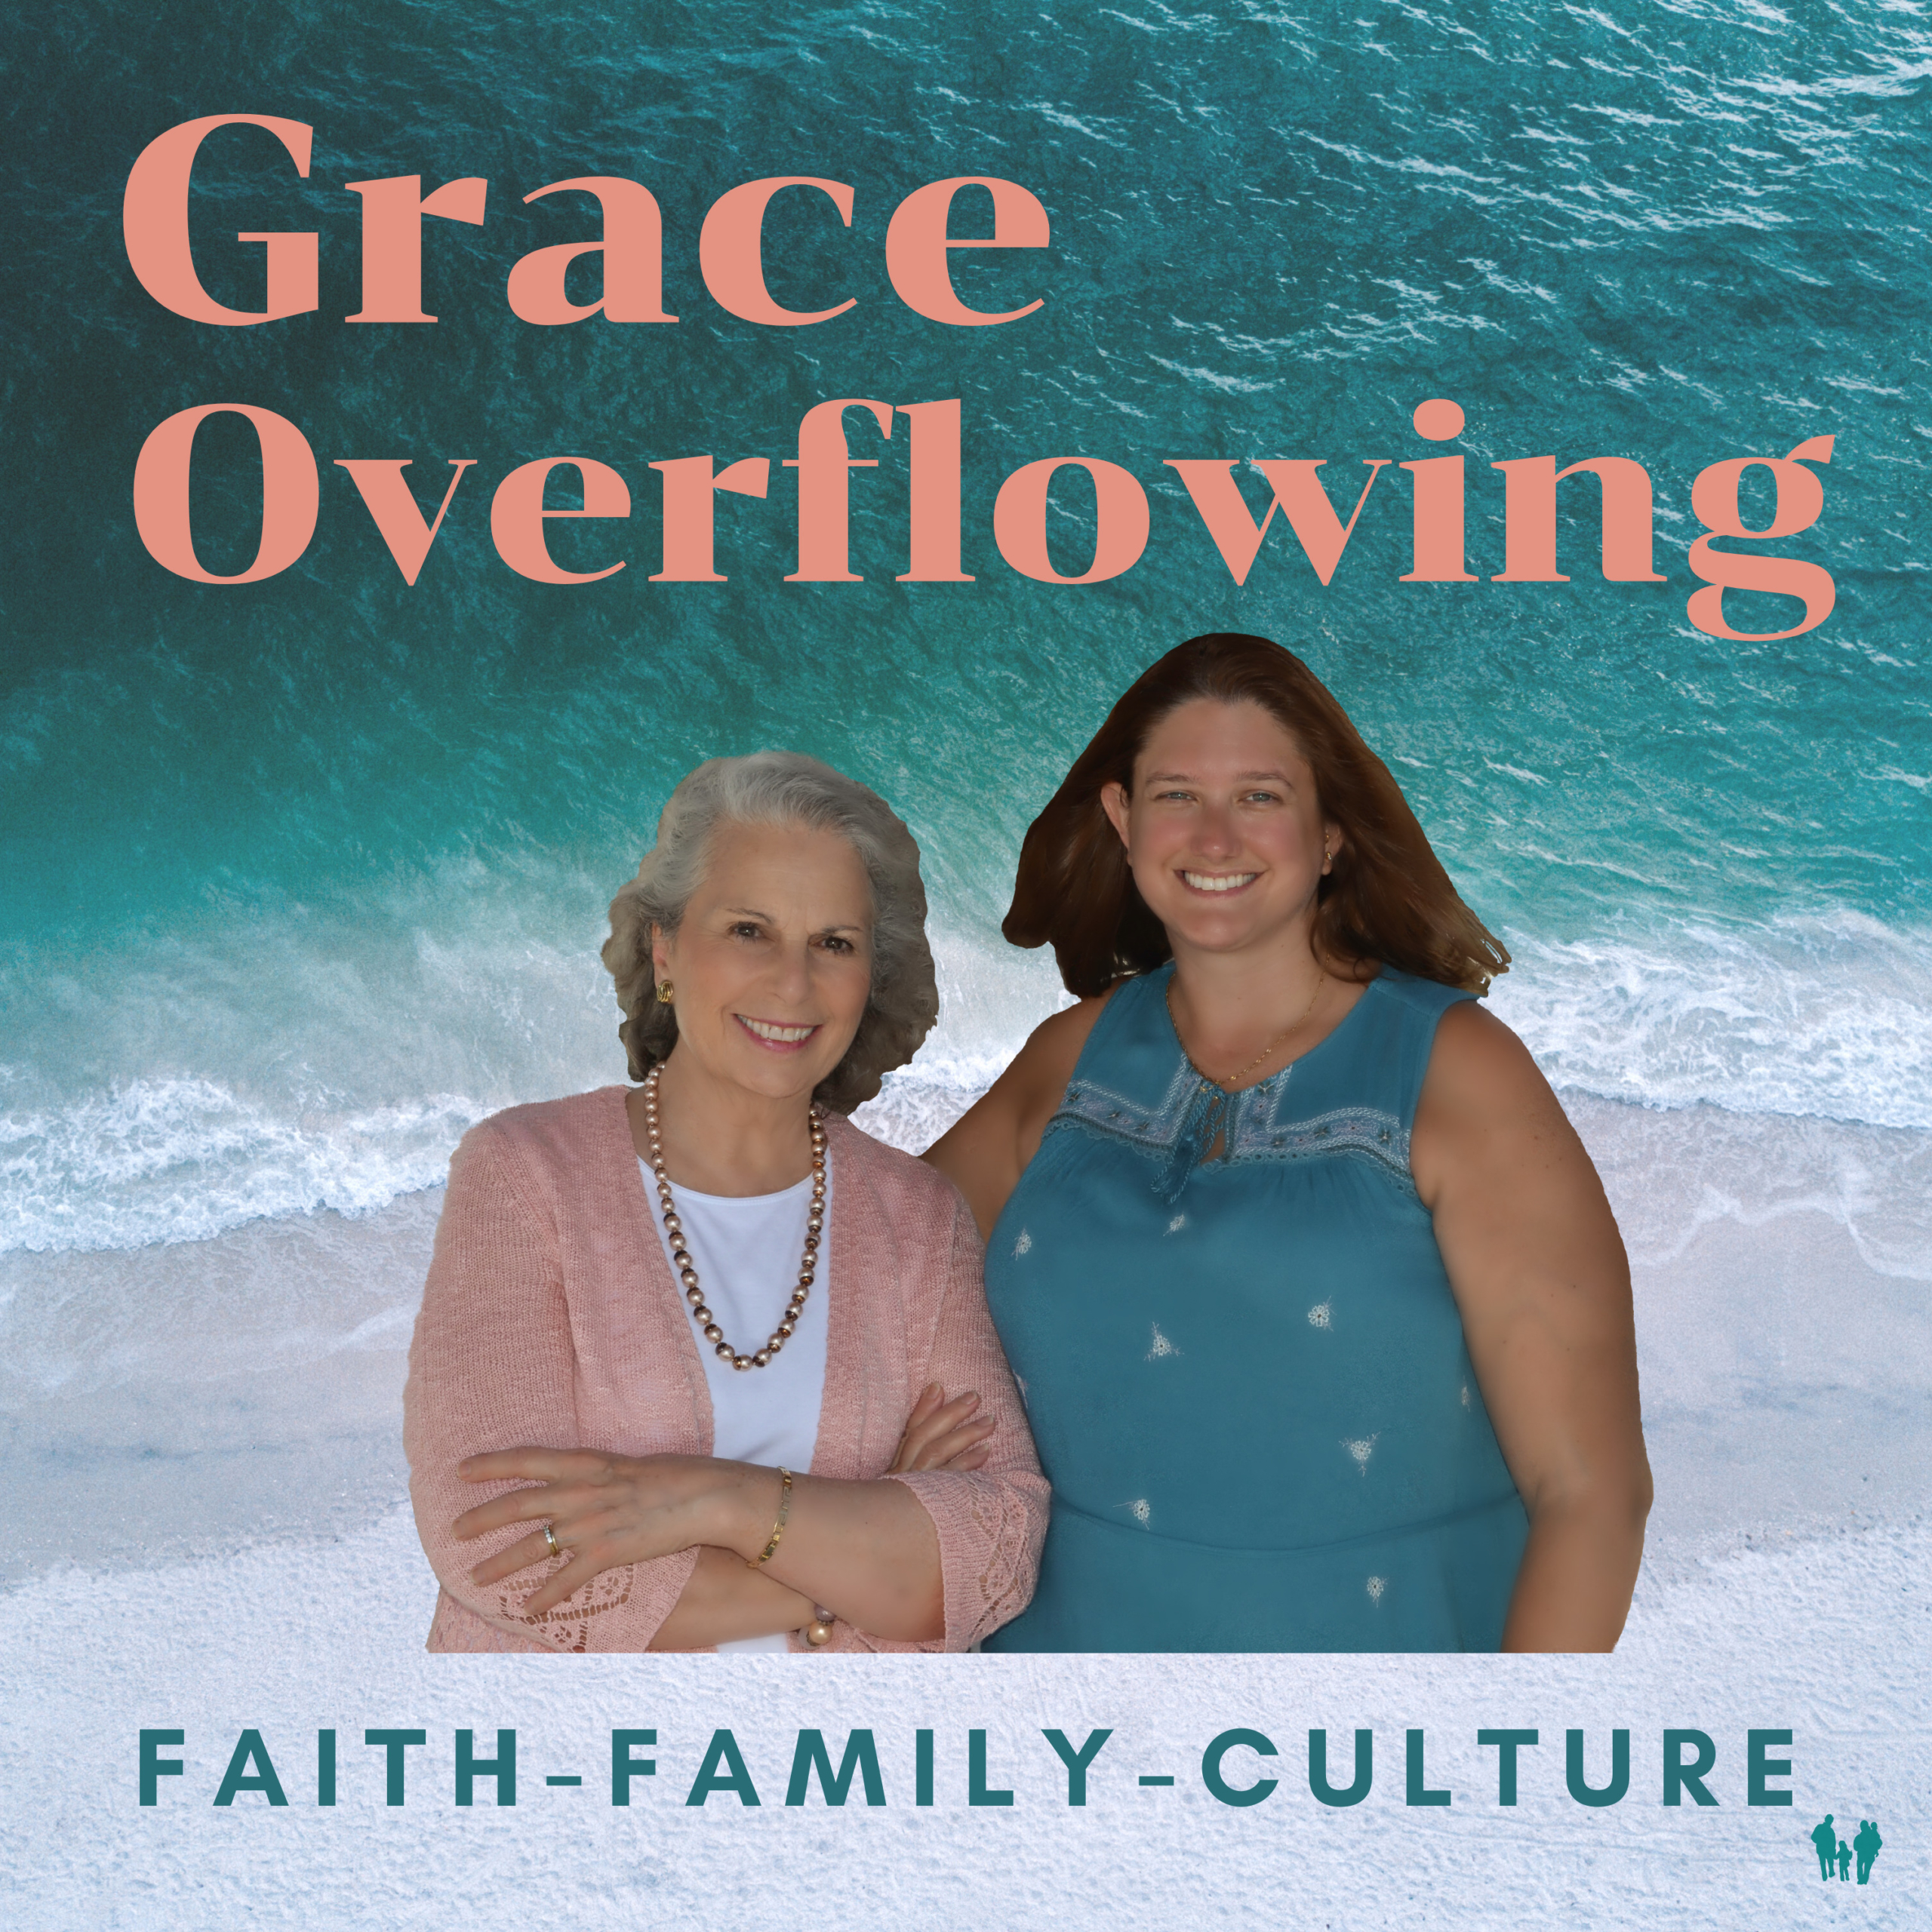 Grace Overflowing, Faith - Family - Culture